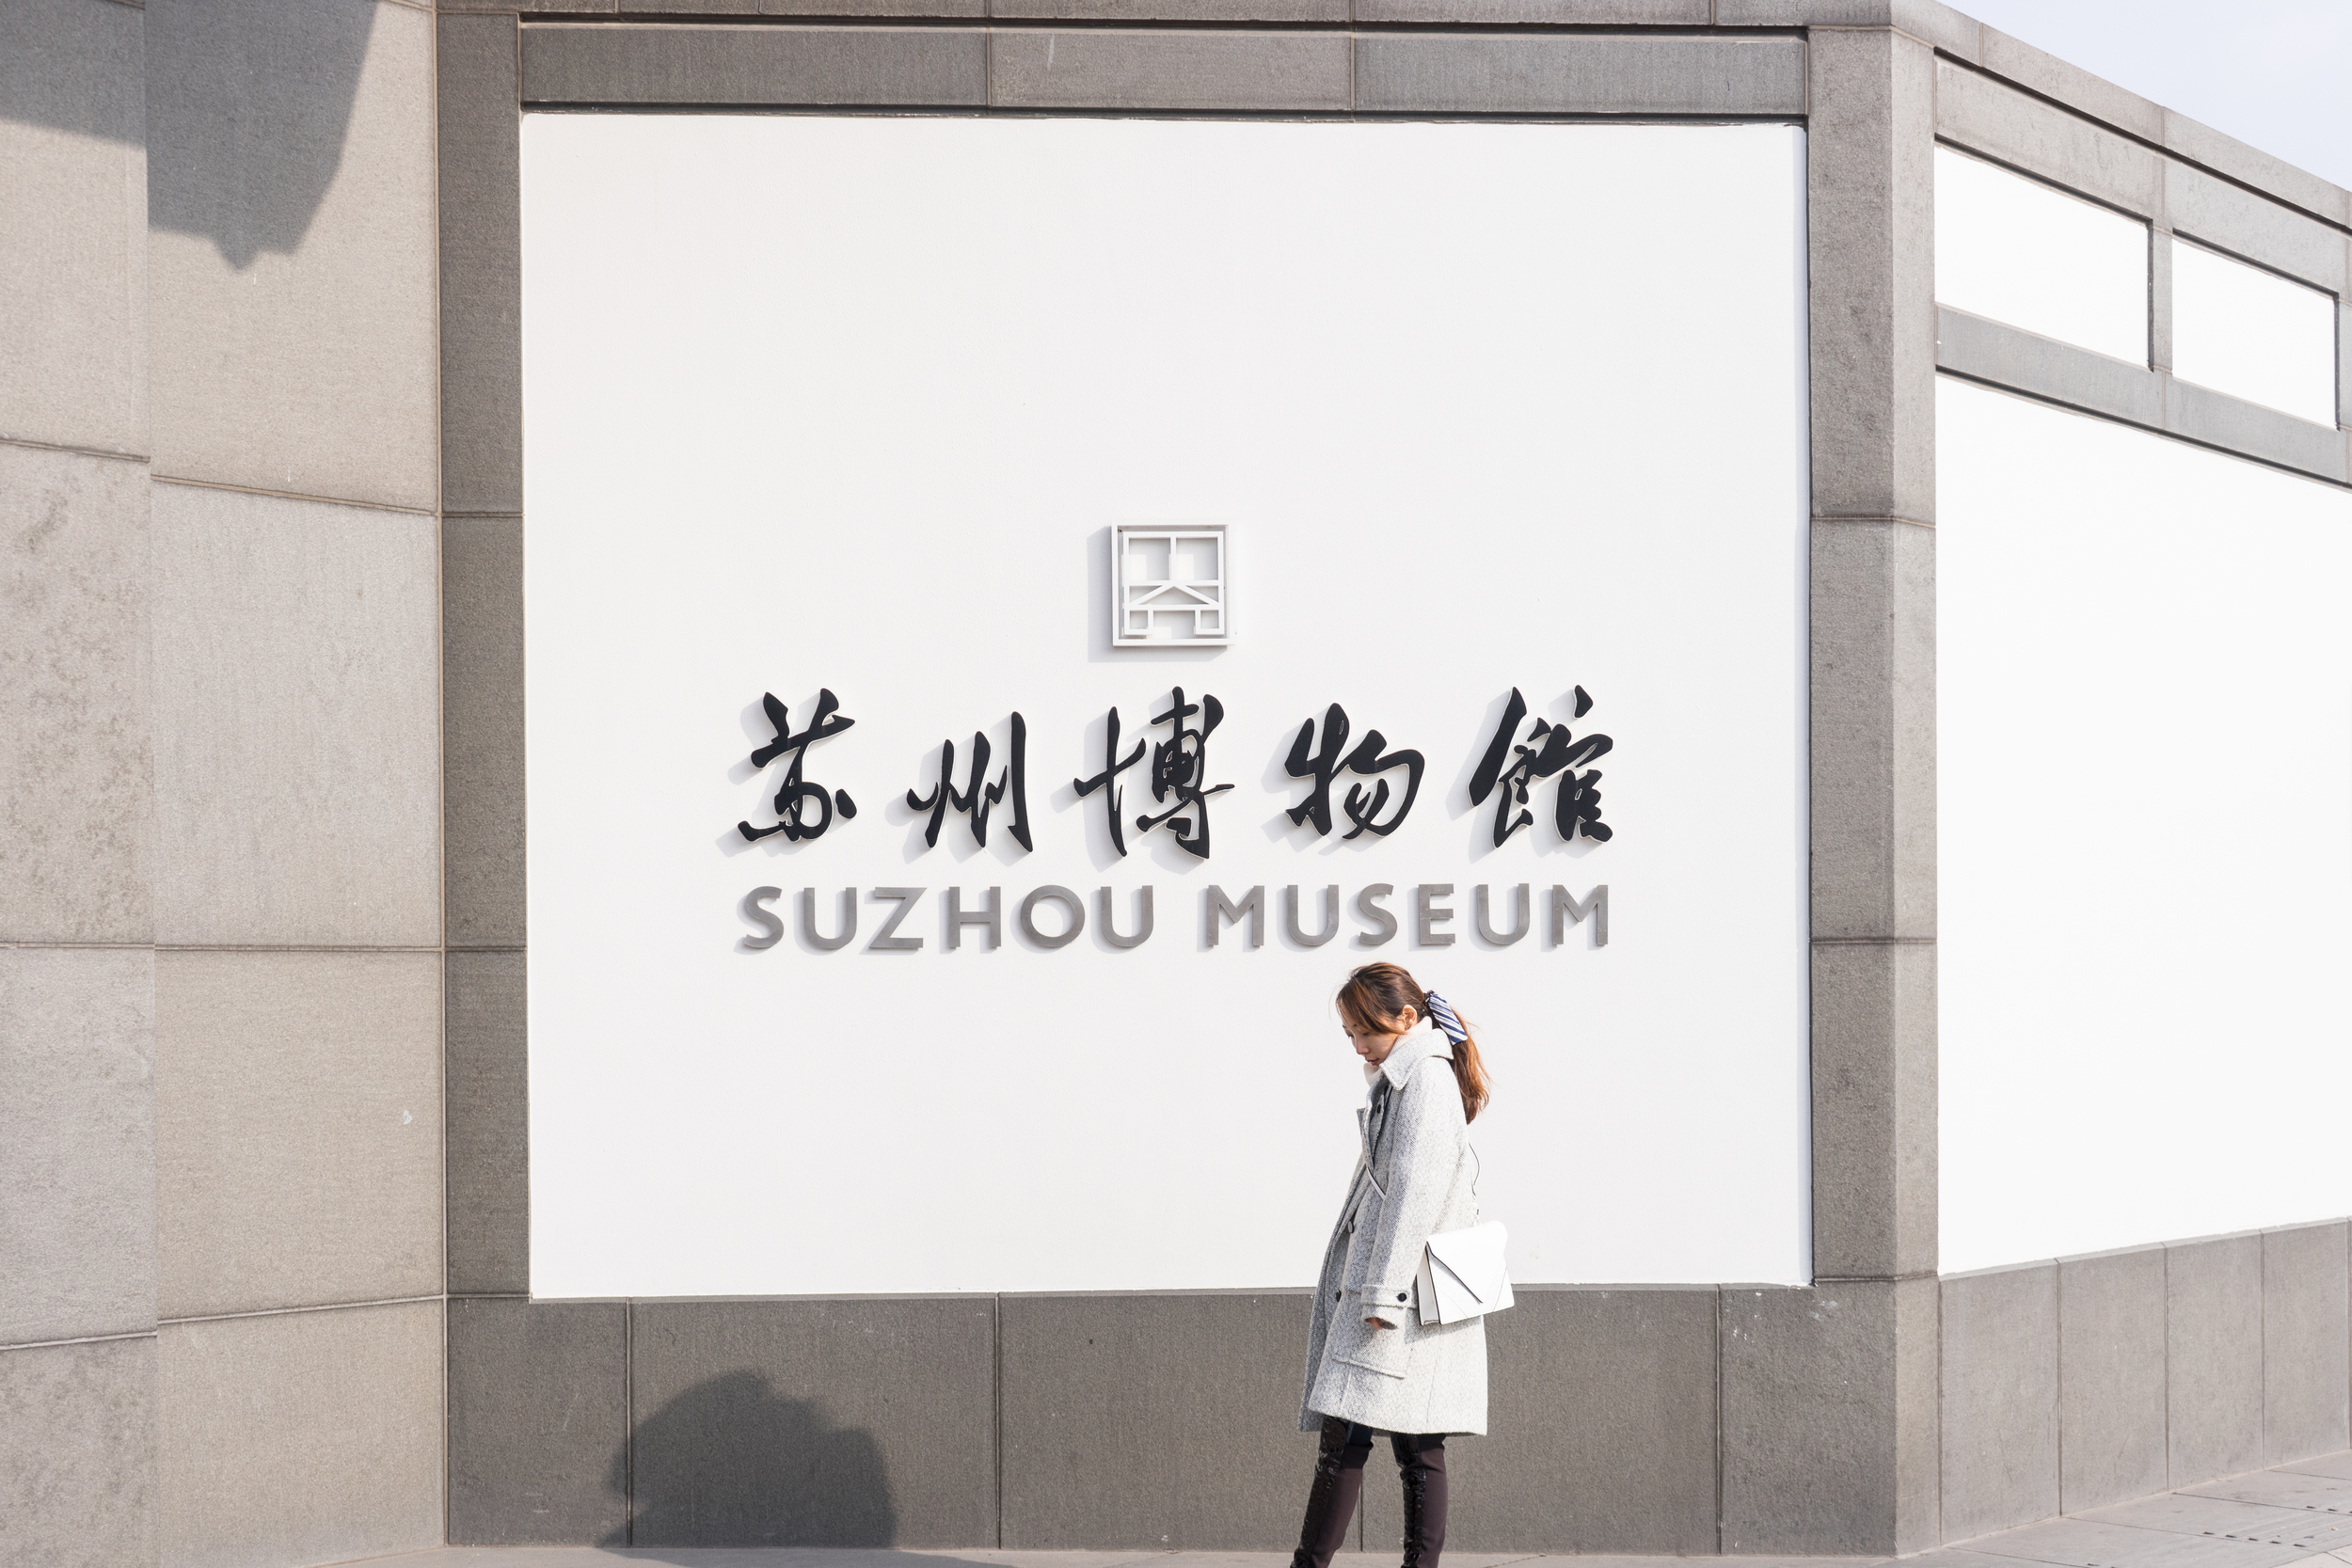 Suzhou Museum Le_Sycomore-1.jpg